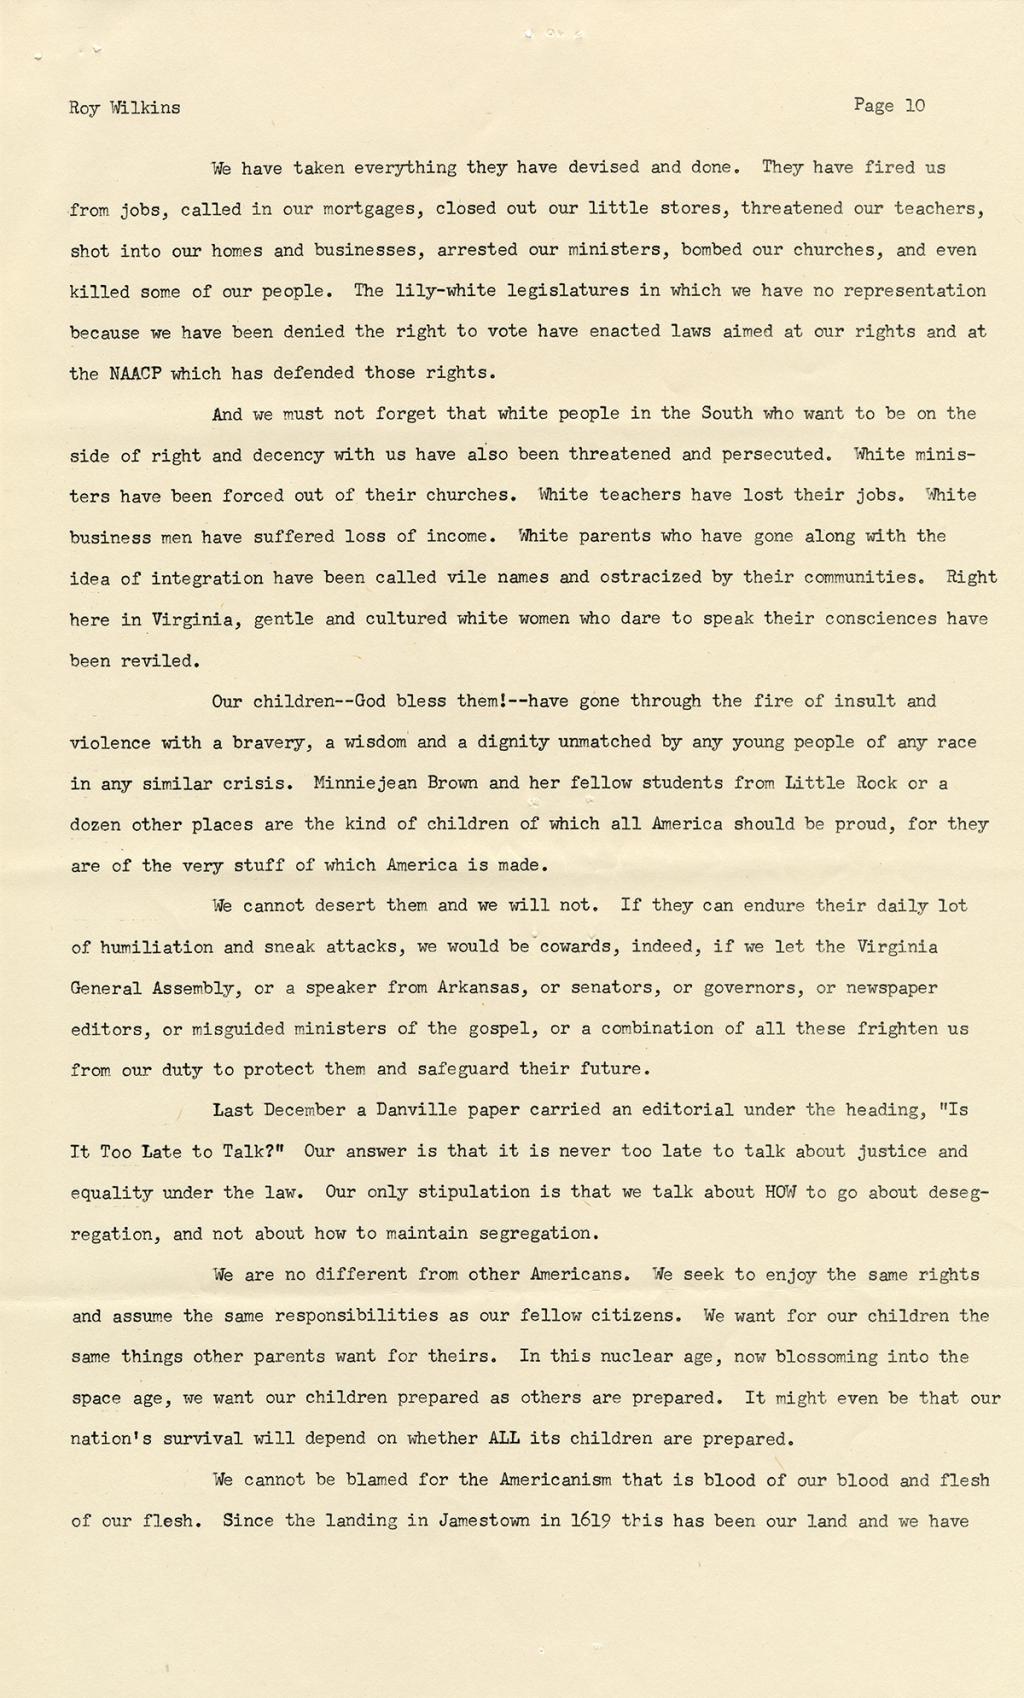 Speech, Roy Wilkins, 27 February 1958 | Virginia Museum of History